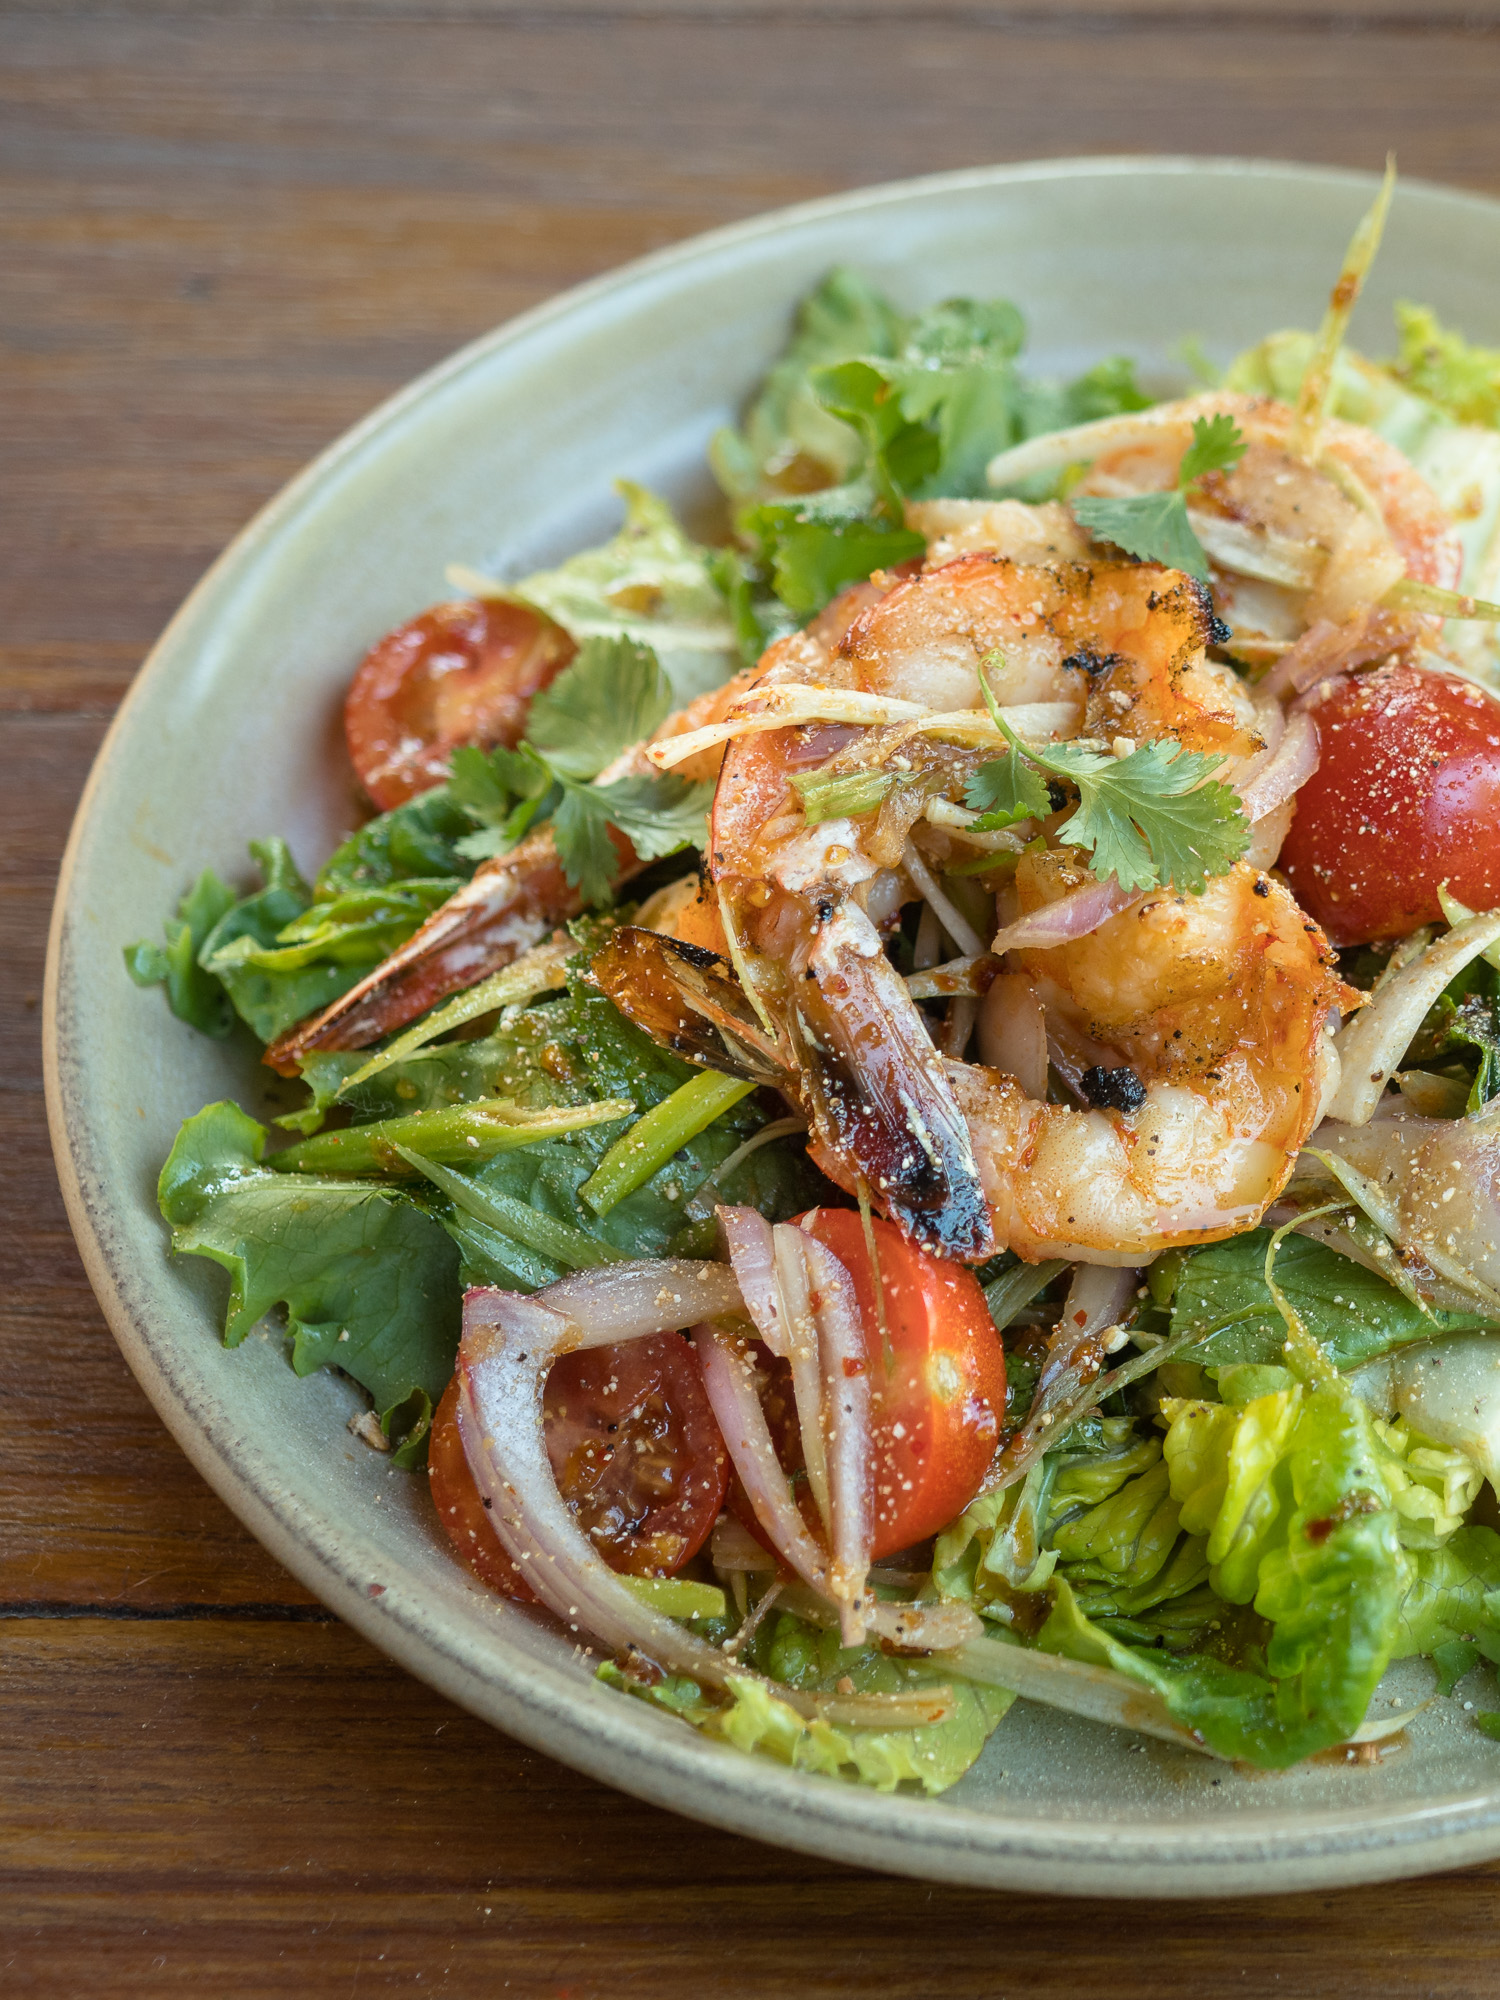 1 paadee portland pdx food photo photography styling foodie thai jeremy pawlowski eats eatsportland eatsamerica cheap